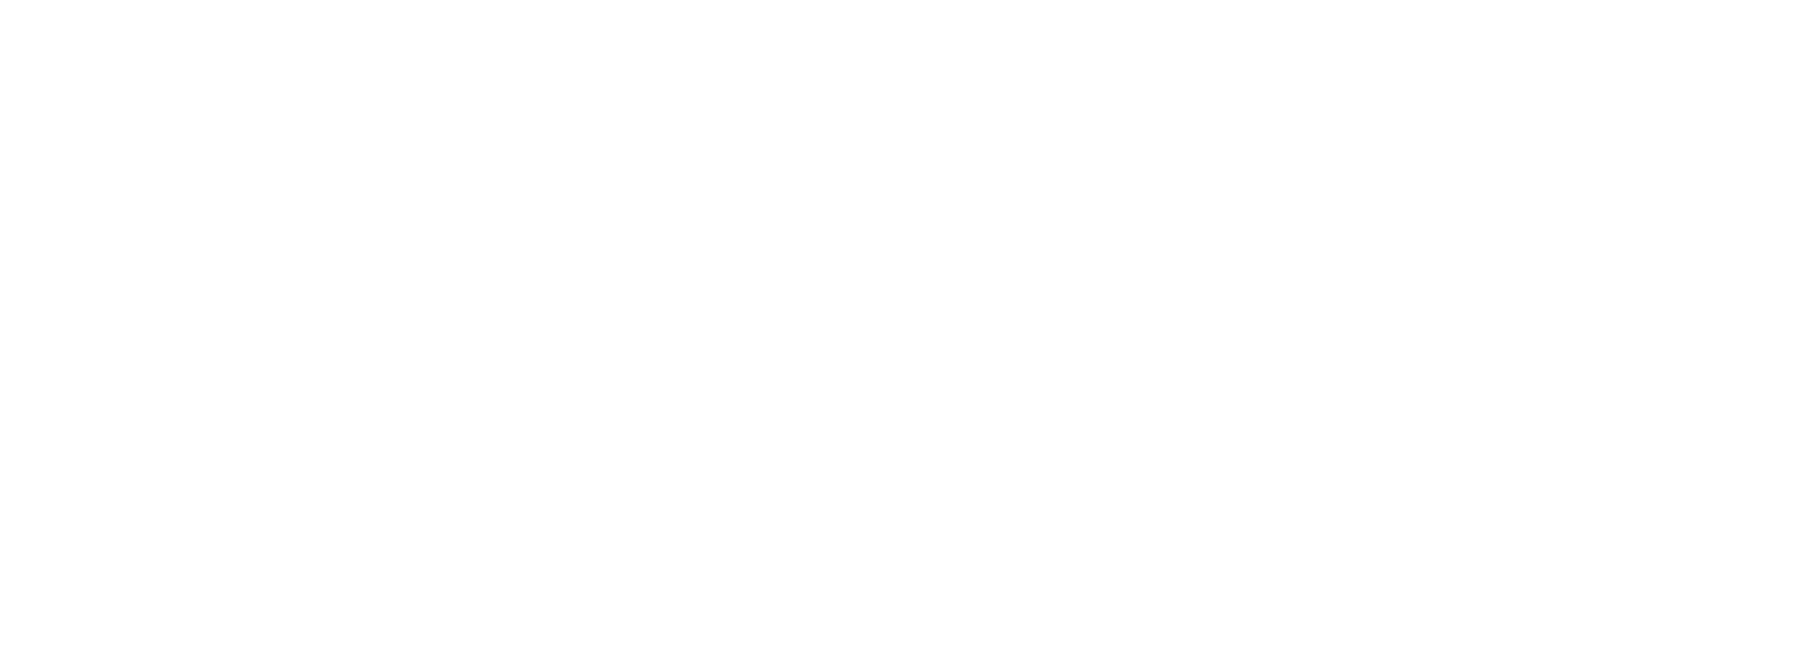 Paragon Films Logo